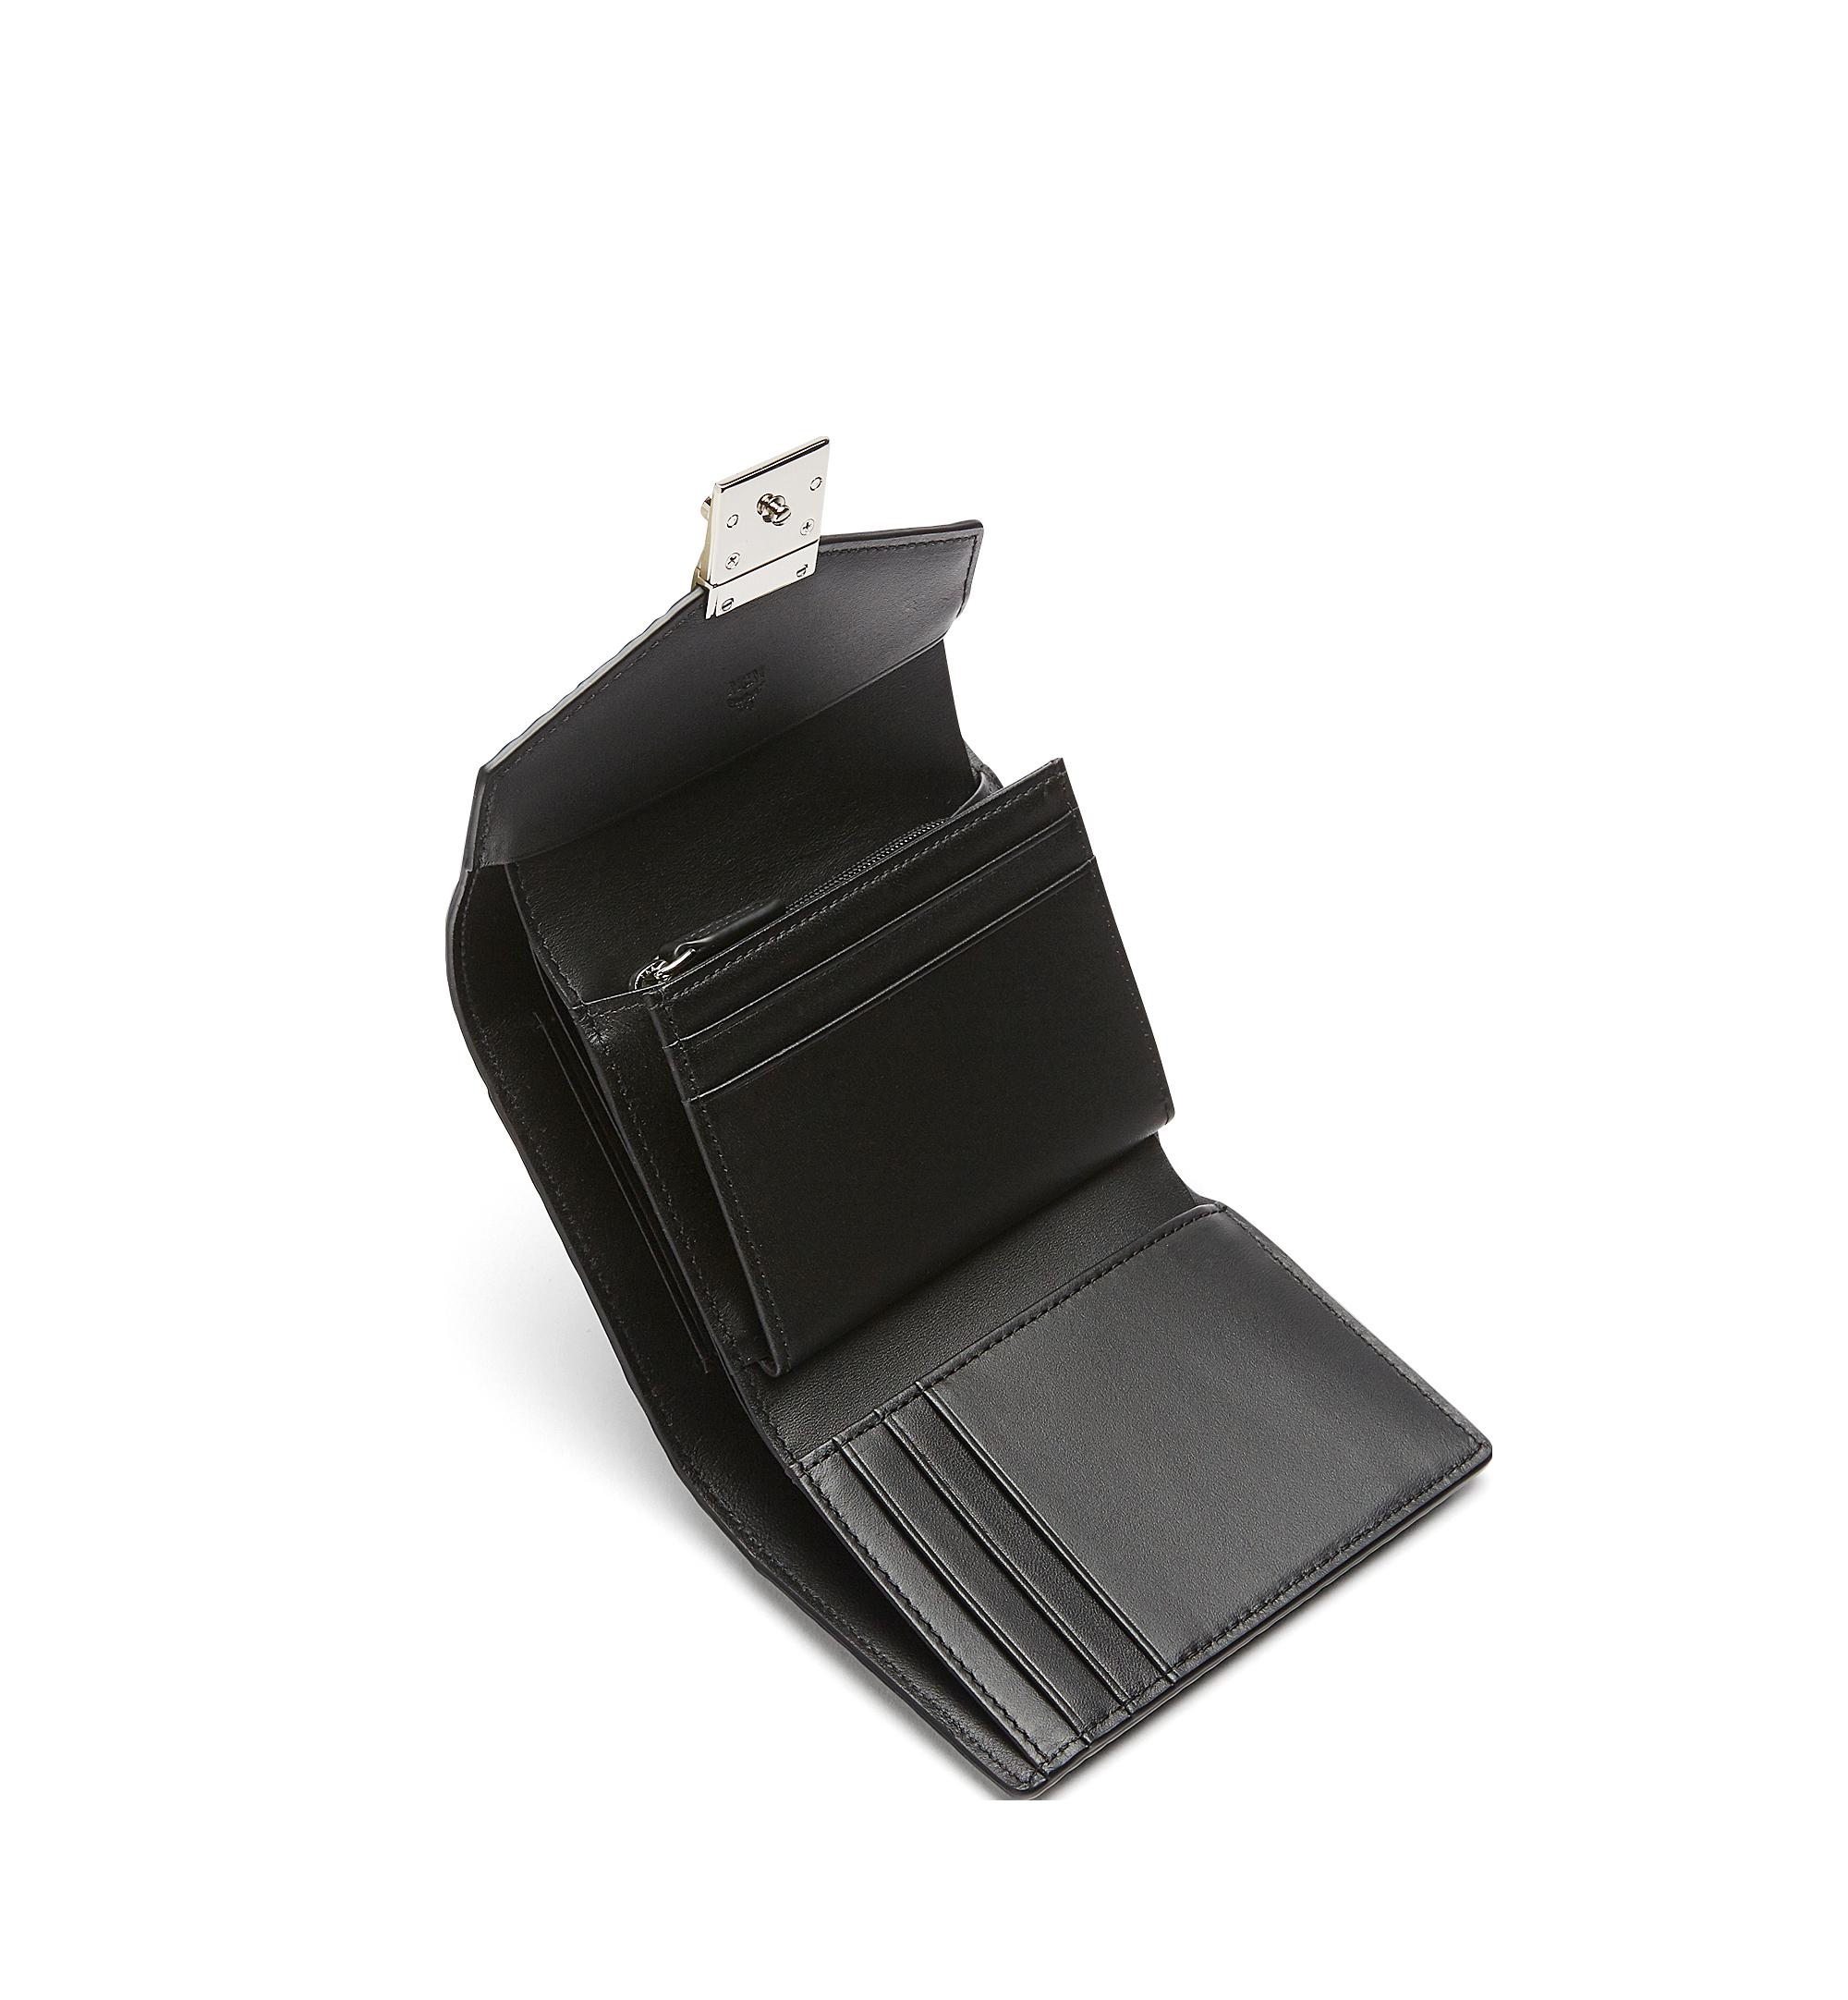 MCM Patricia Three Fold Wallet in Visetos Black MYS7SPA12BK001 Alternate View 4